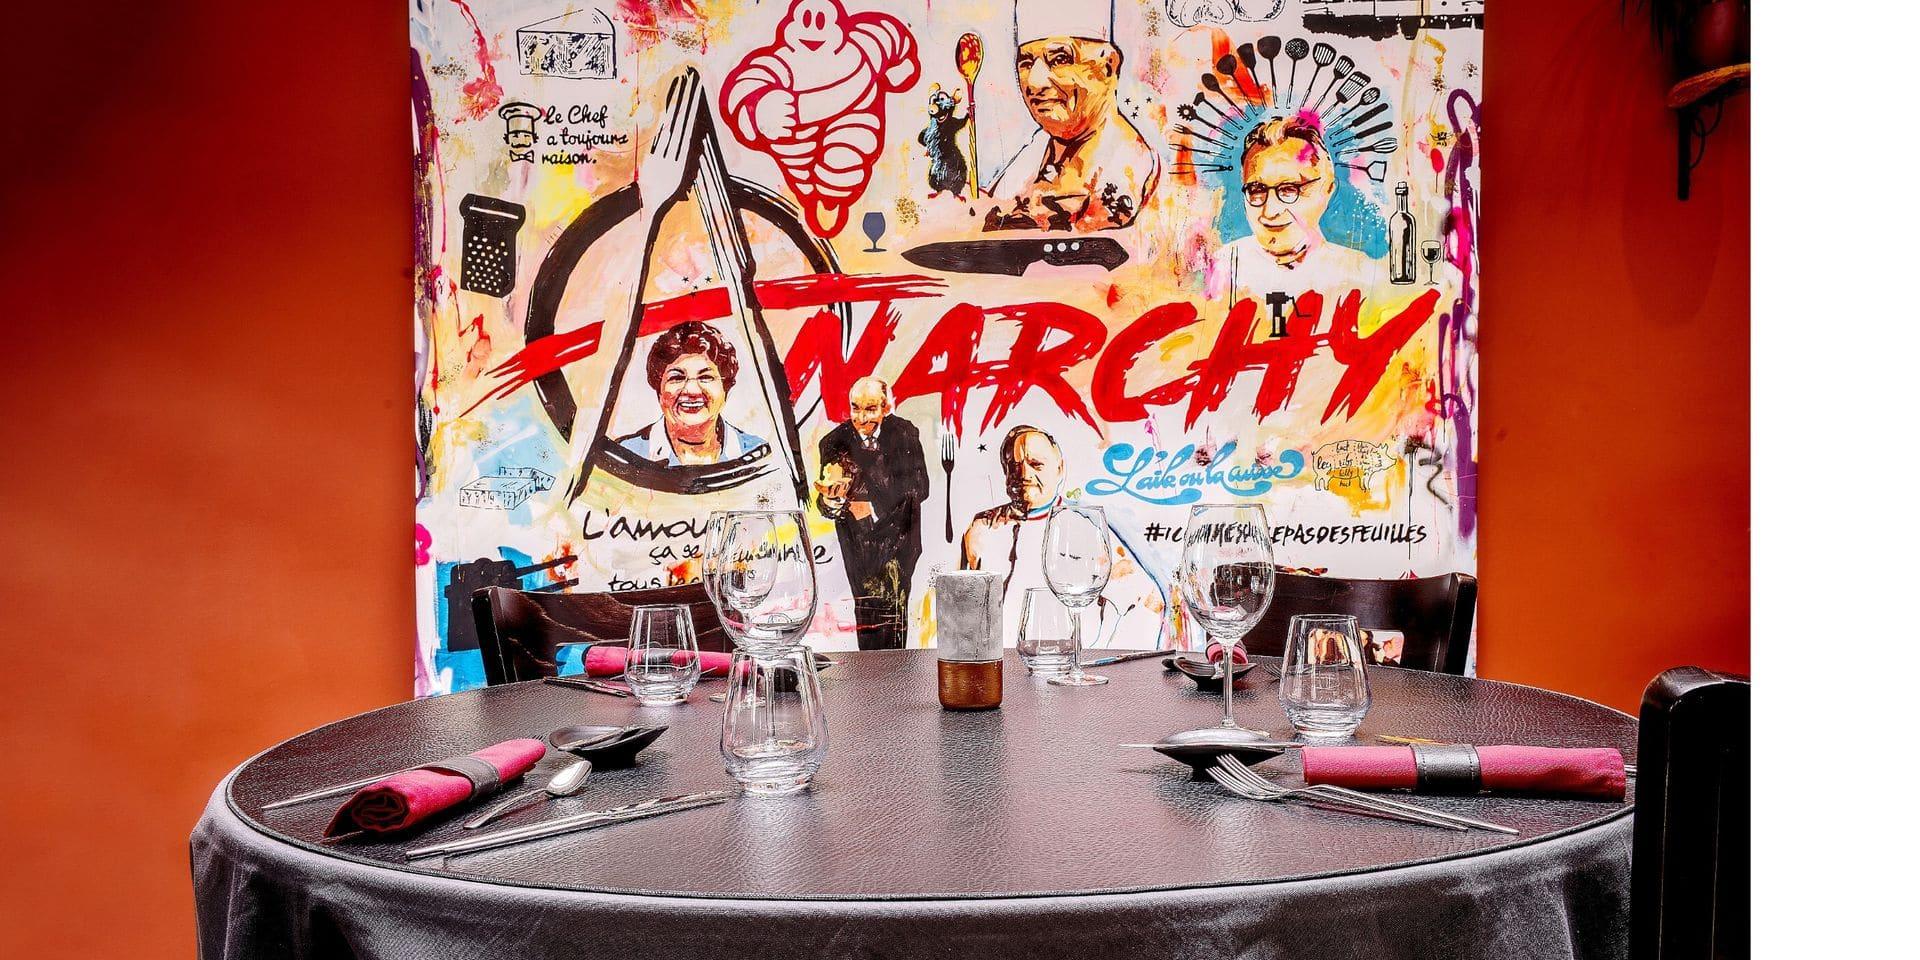 Quand Anarchy rime avec harmonie